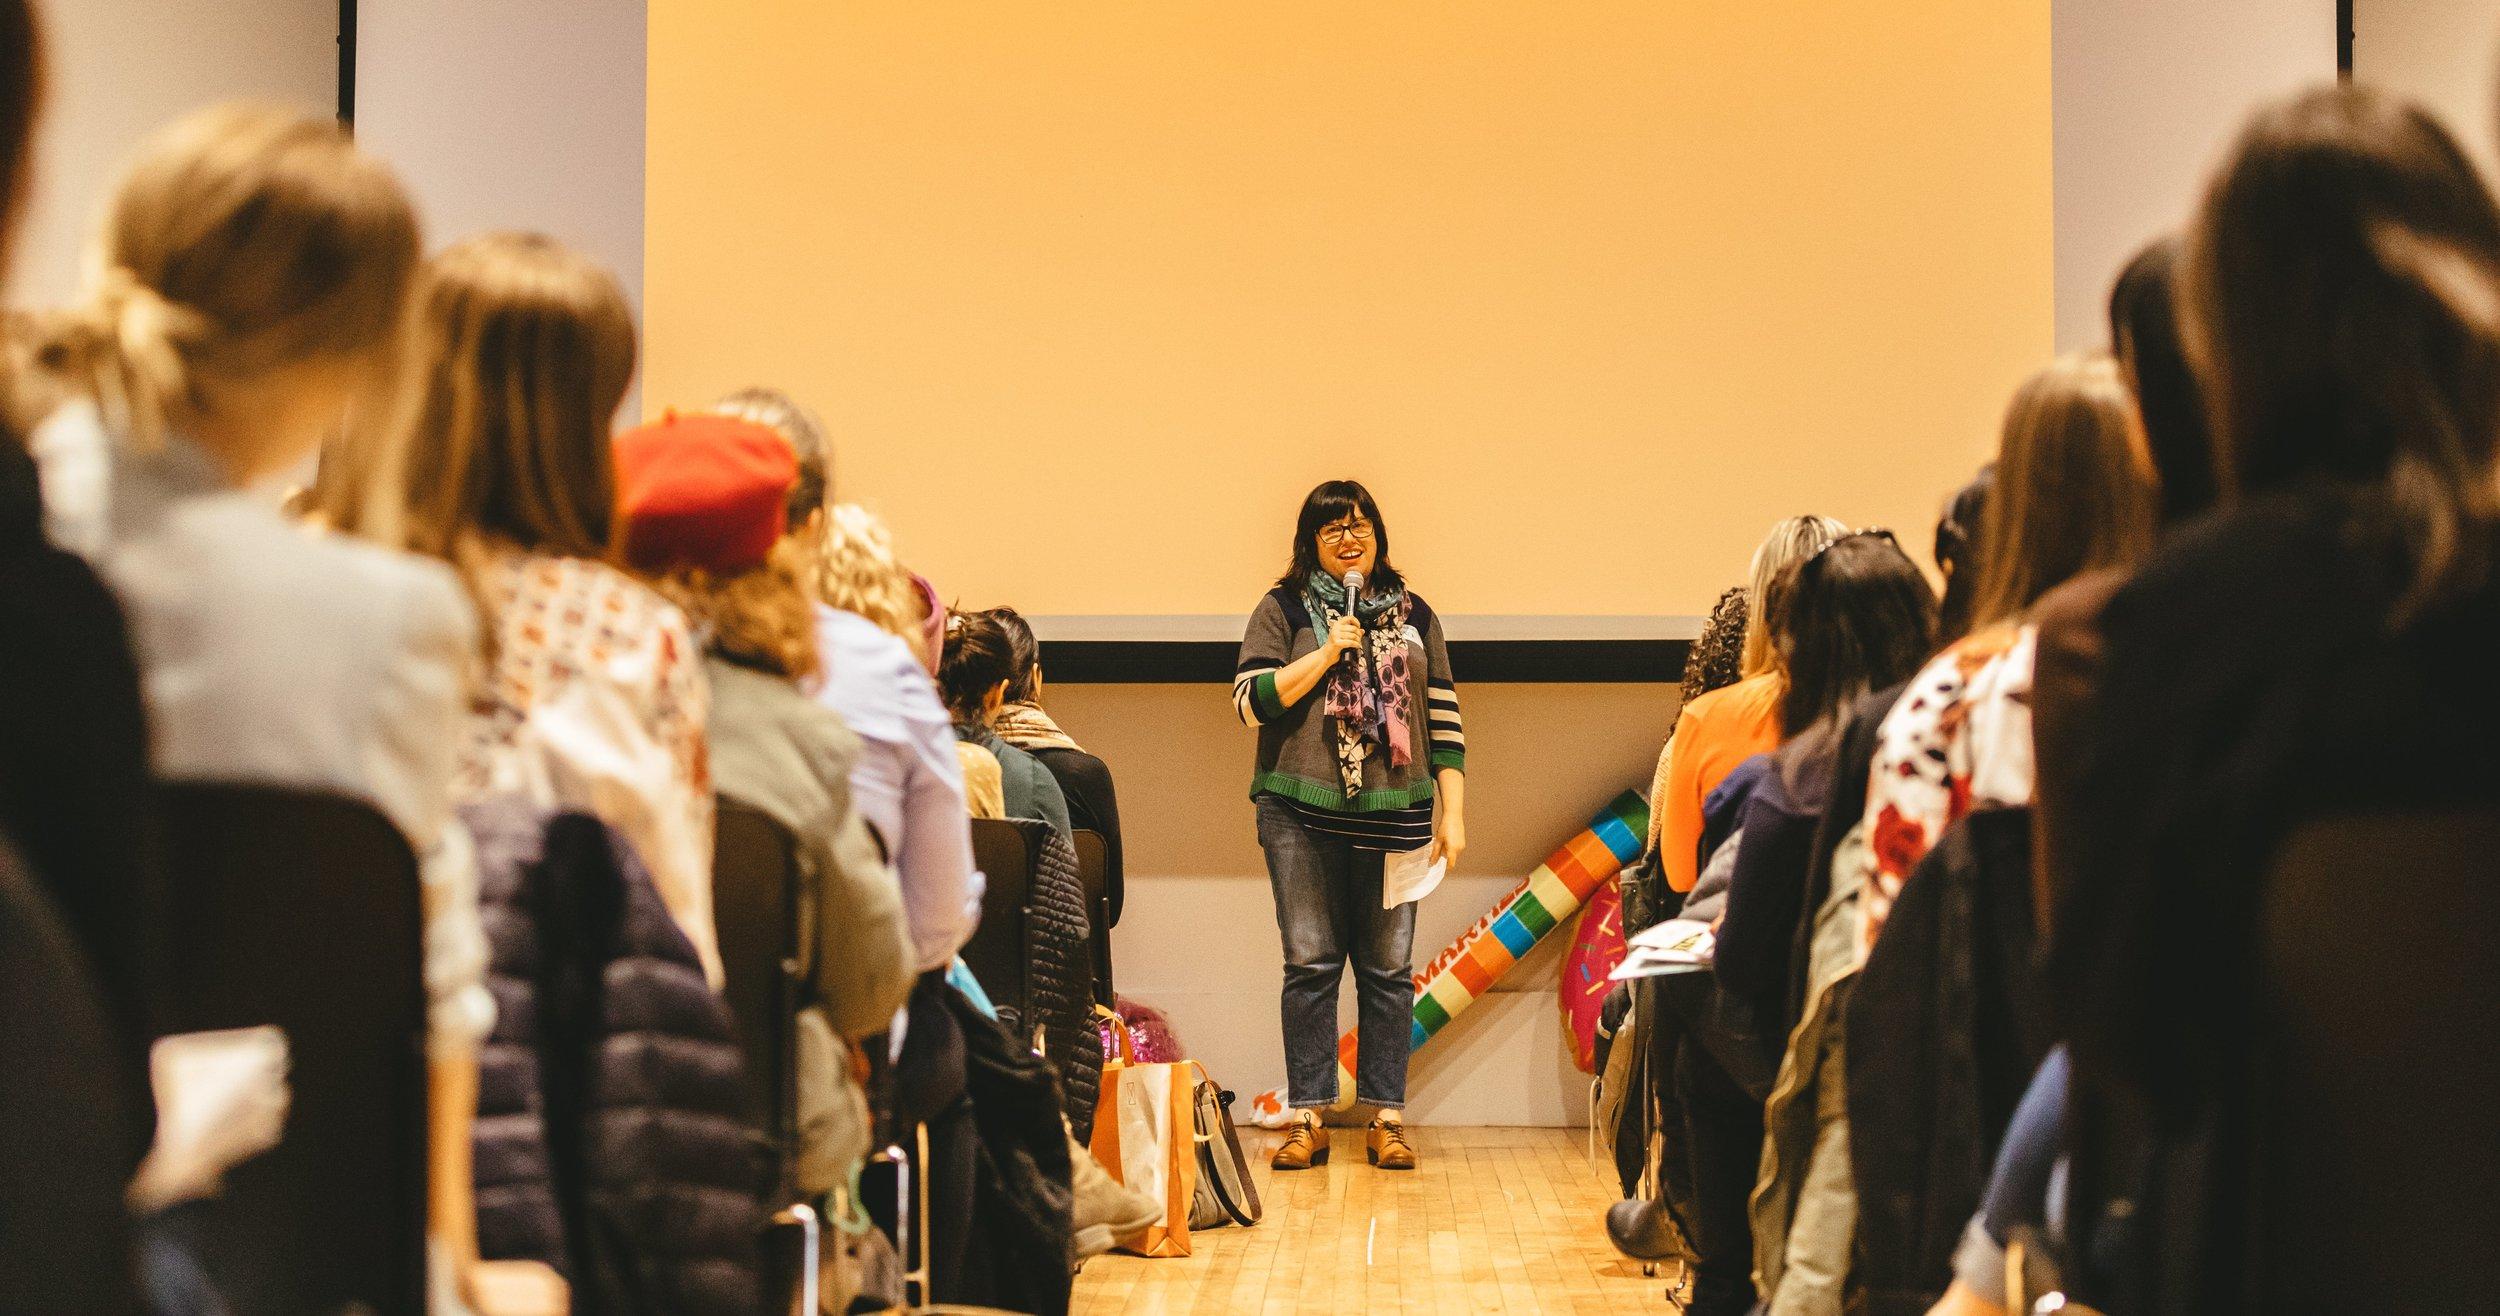 2018-PDX-Creative-Women-Unite-72[1]-min.jpg